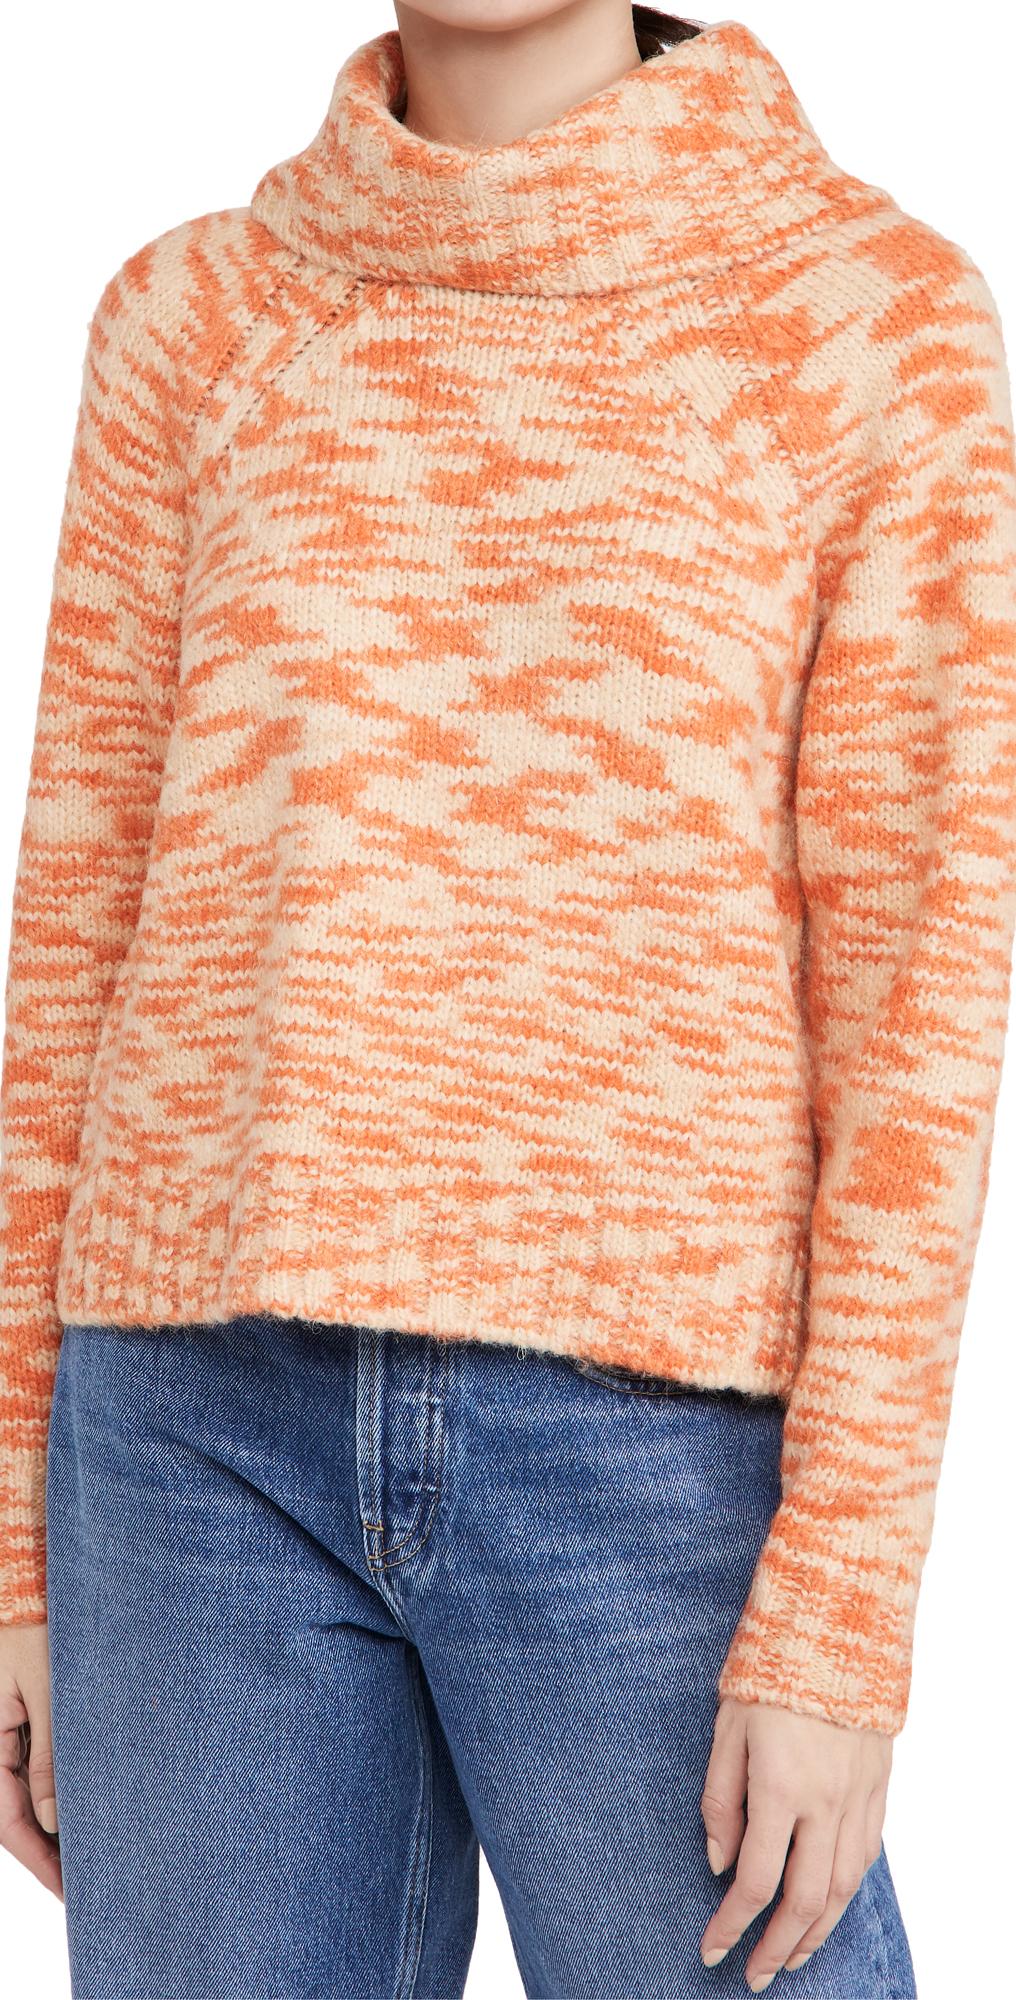 Joie Kaine Sweater